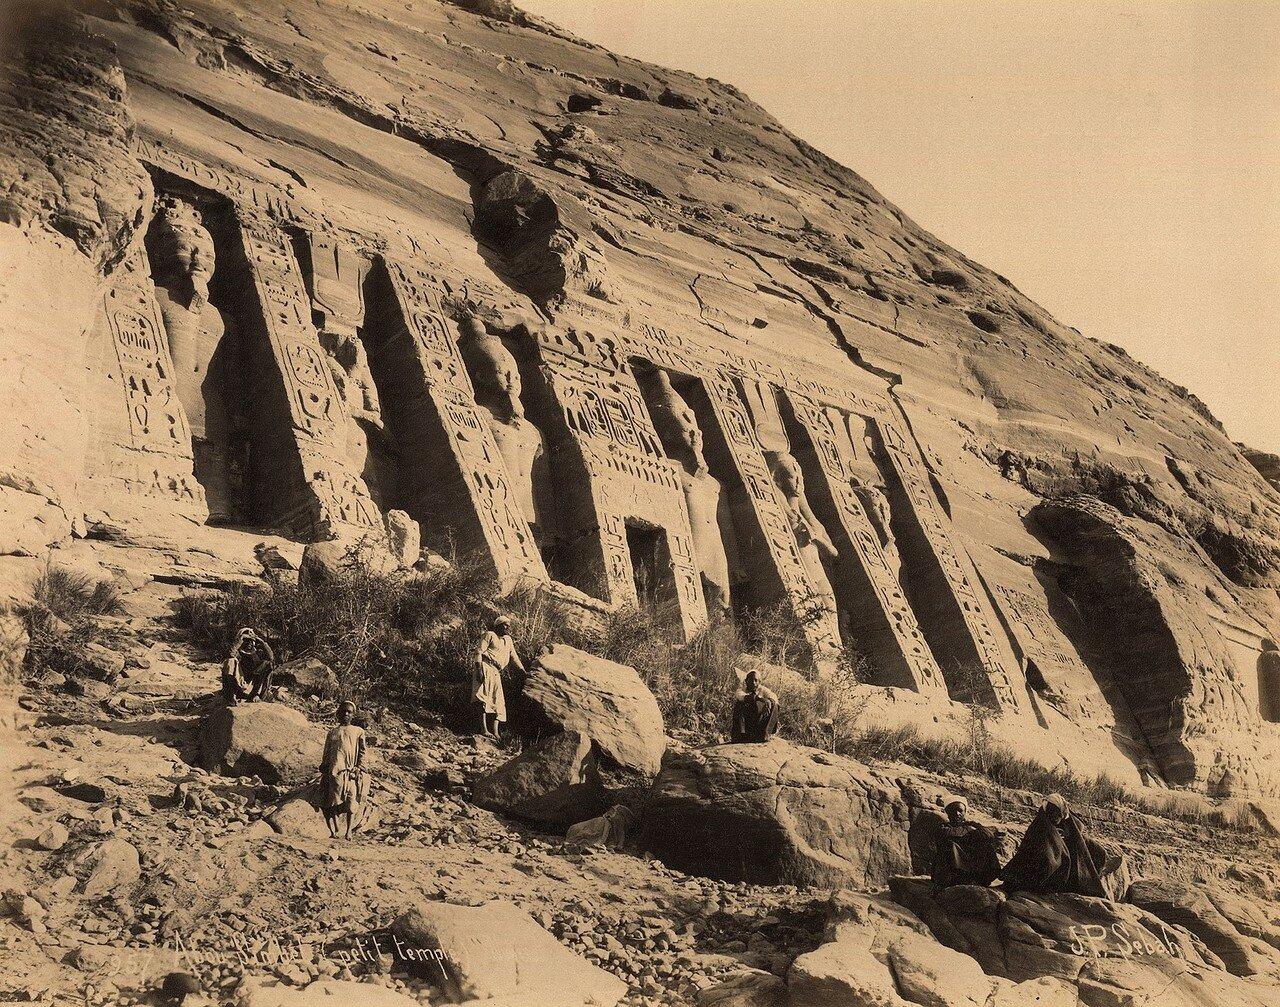 Абу Симбел. Храм со статуями Рамсеса II и Нефертари